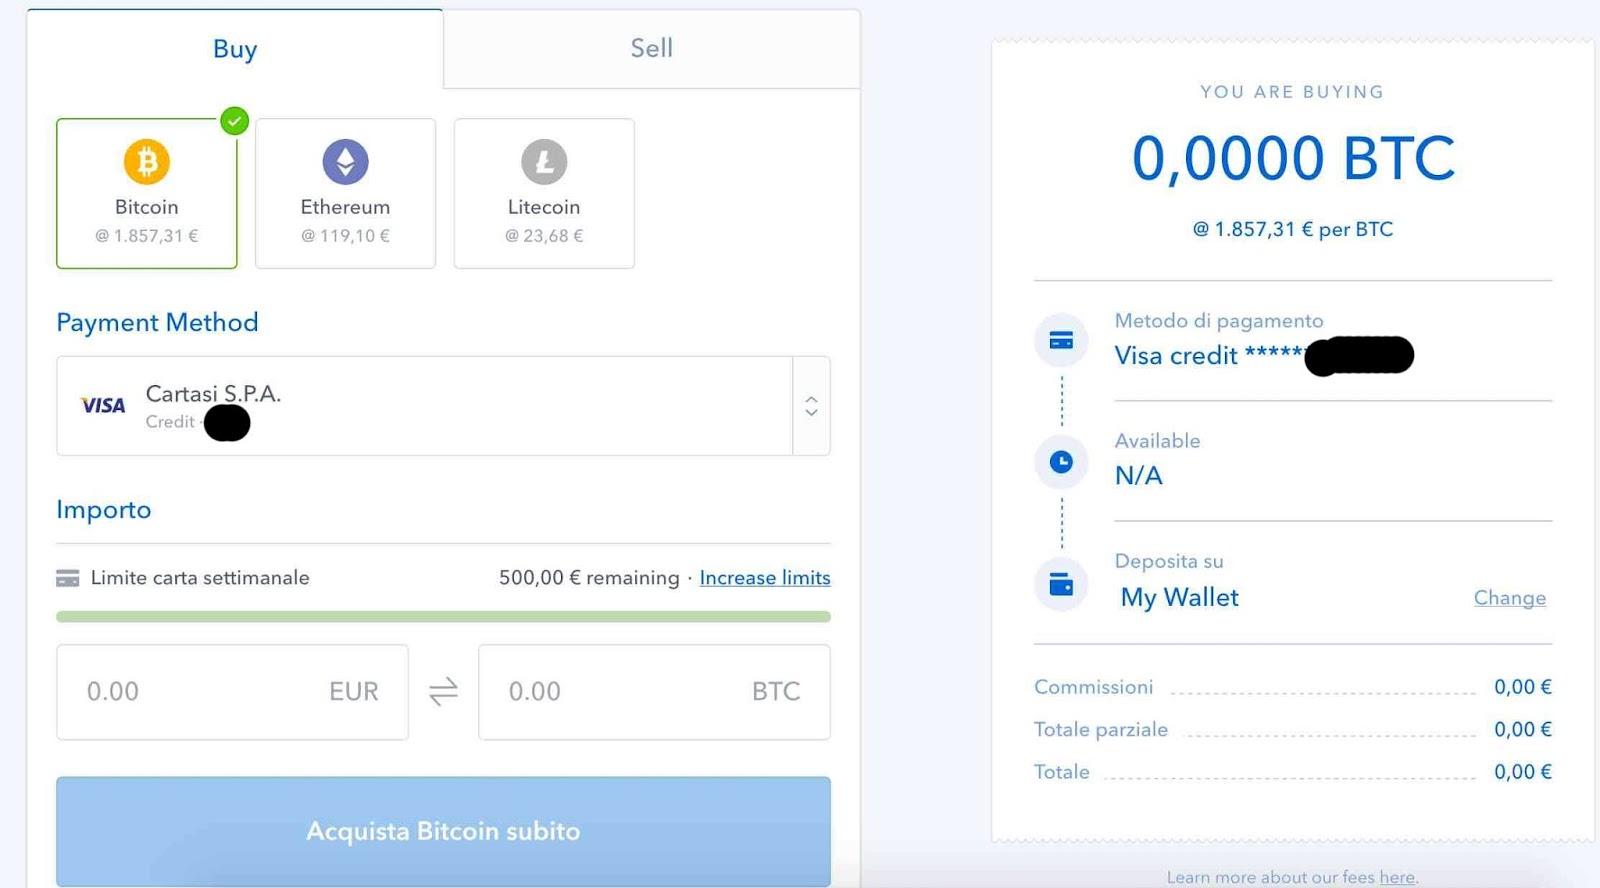 acquista bitcoin nyc